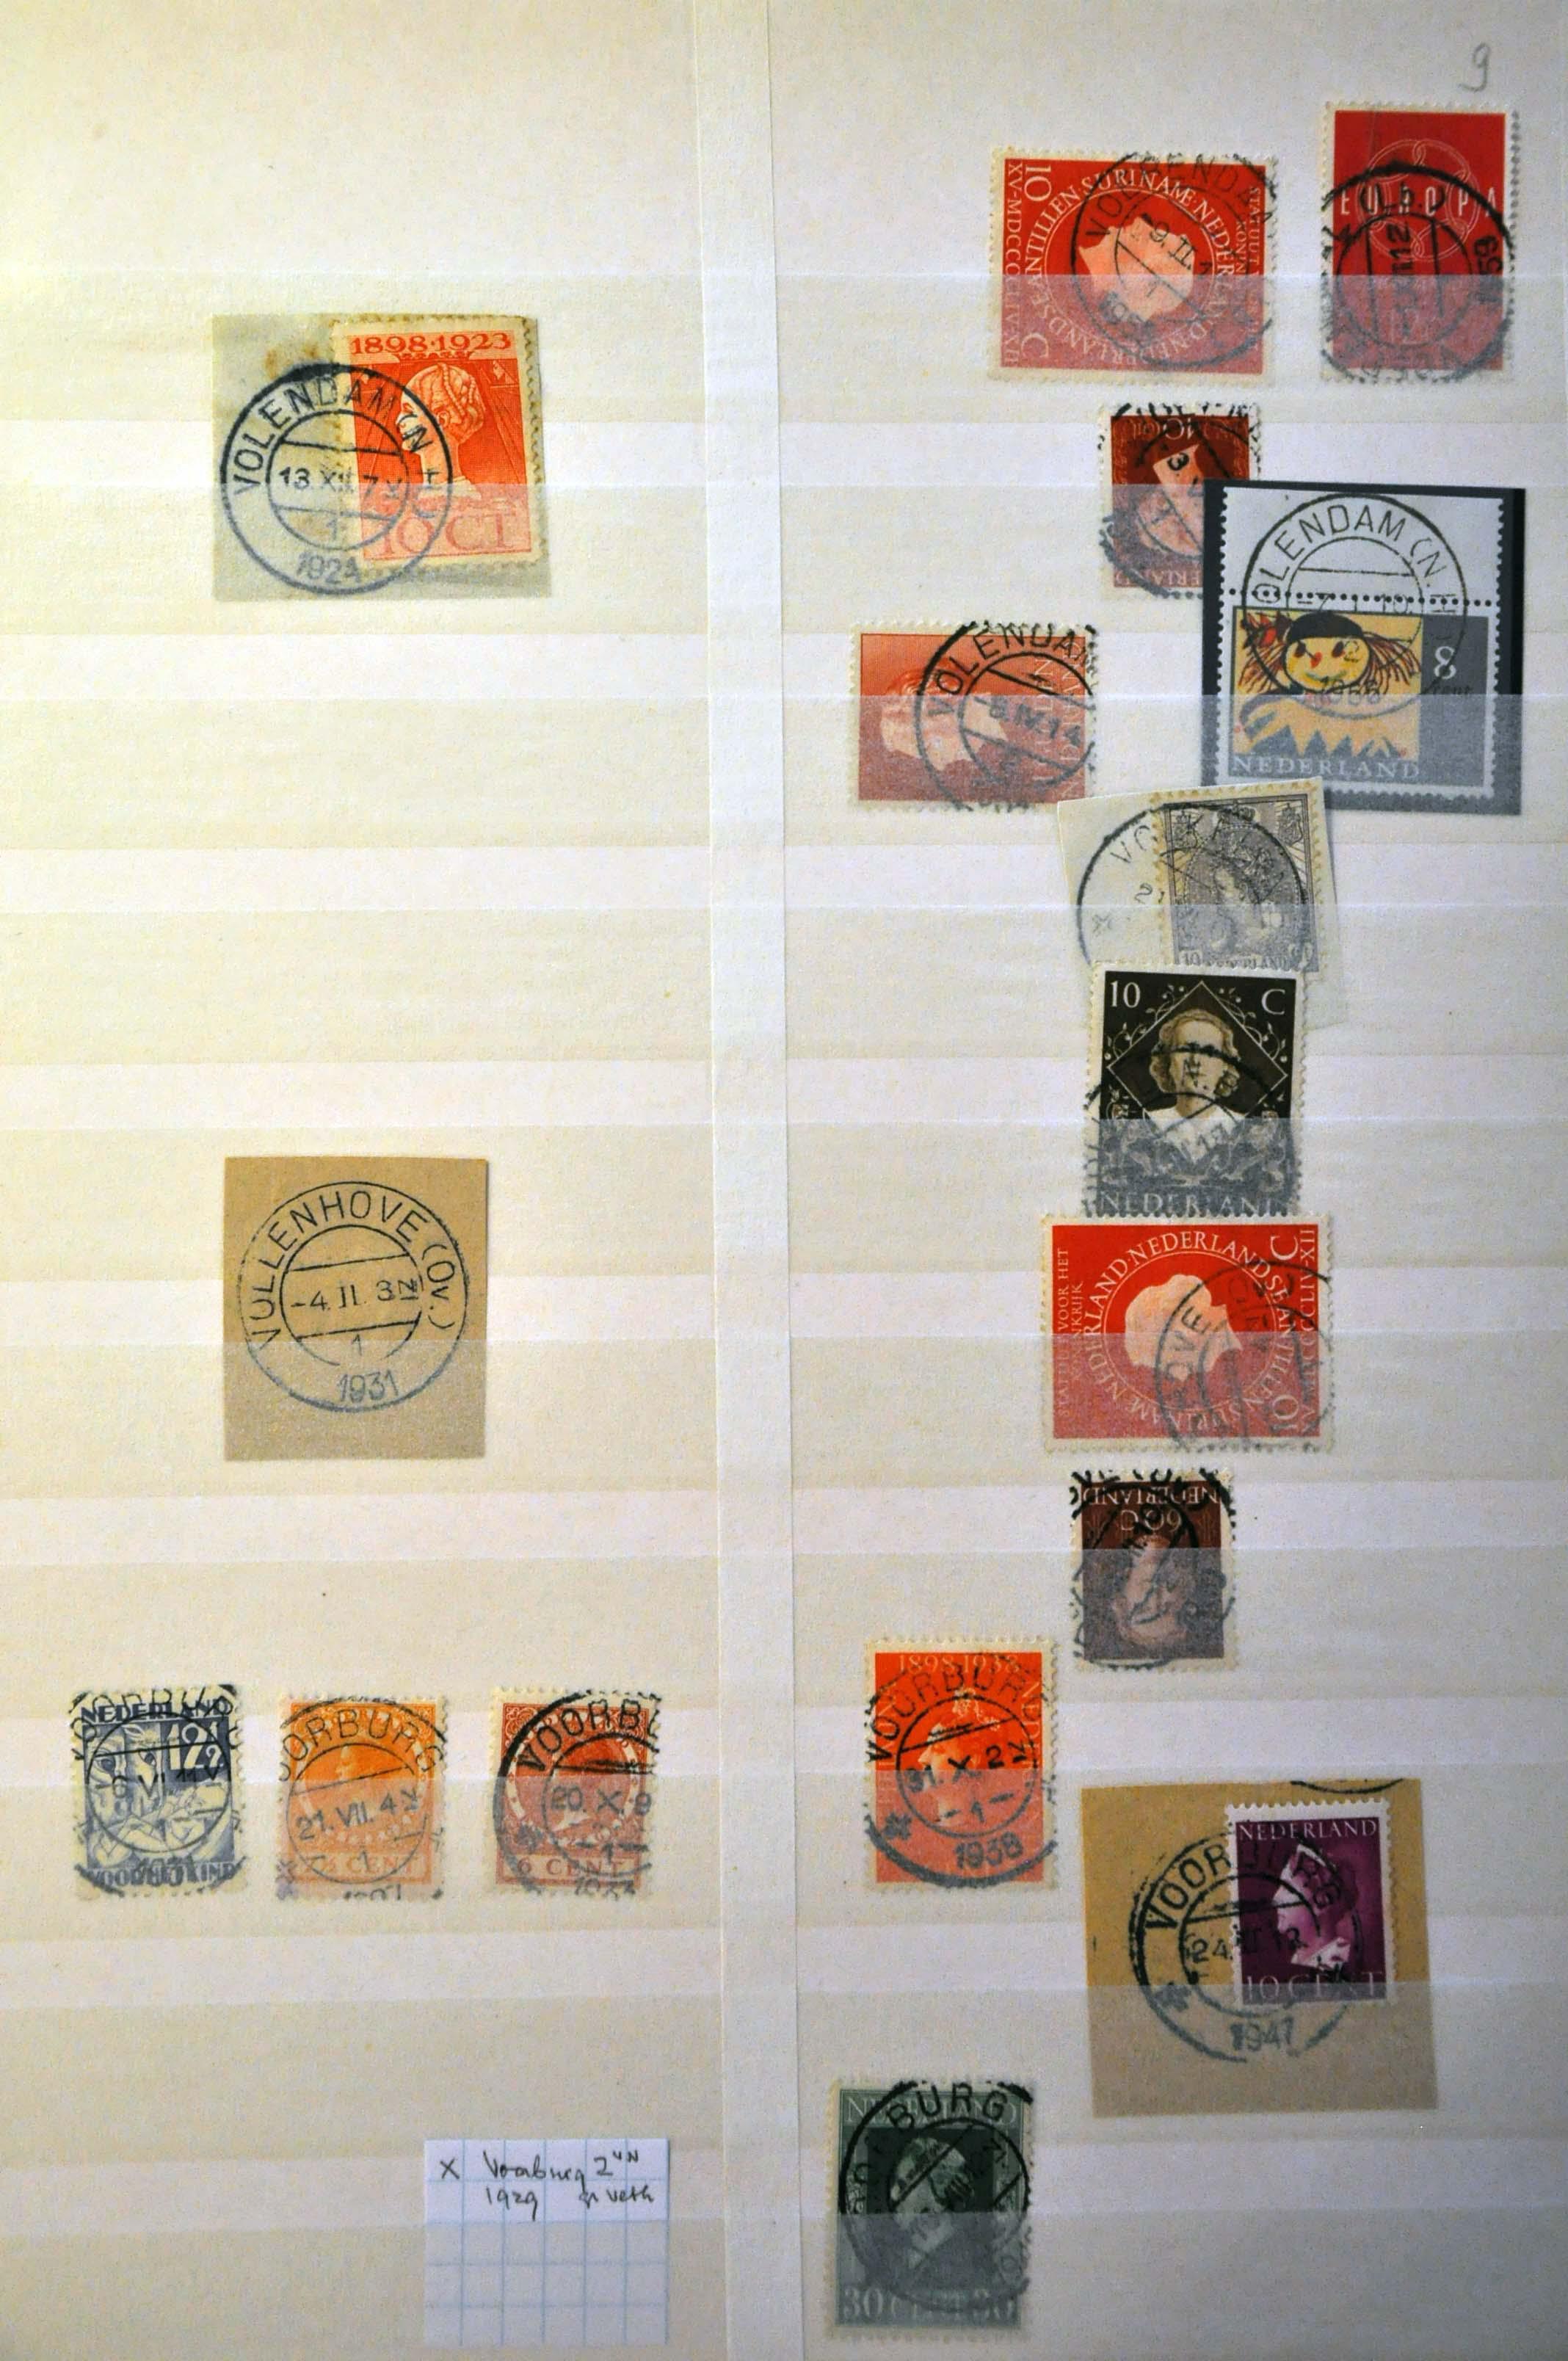 Lot 1482 - Netherlands and former colonies Netherlands -  Corinphila Veilingen Auction 239: General sale